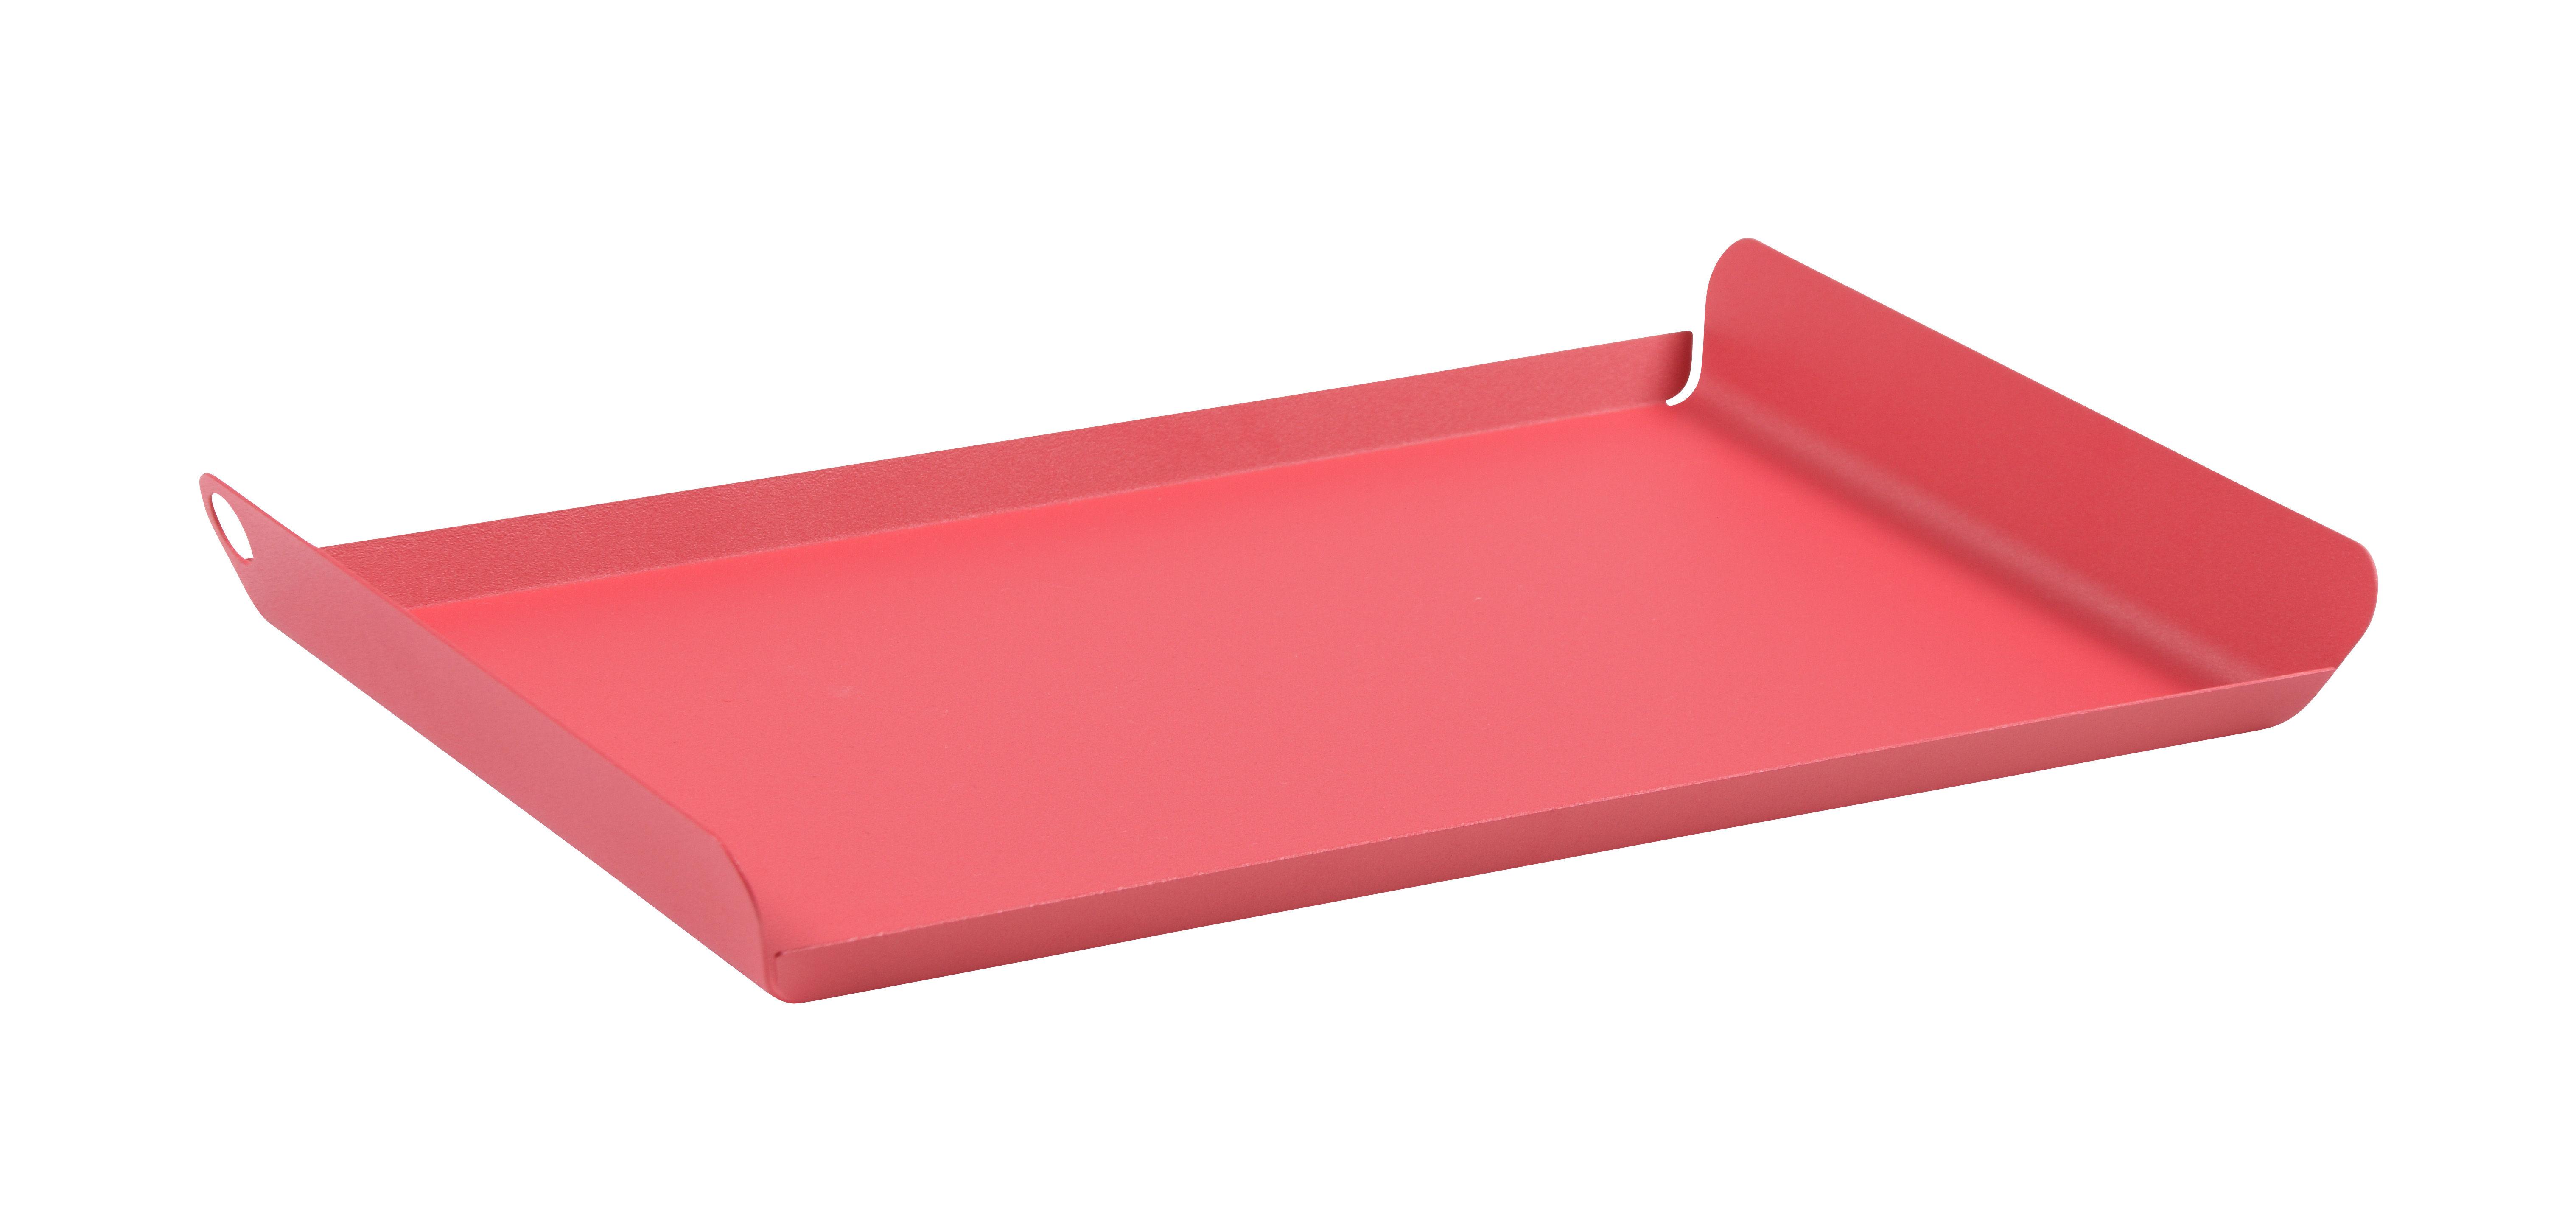 Tableware - Trays - Alto Tray - / Steel - 36 x 23 cm by Fermob - Praline pink - Electro-galvanized steel